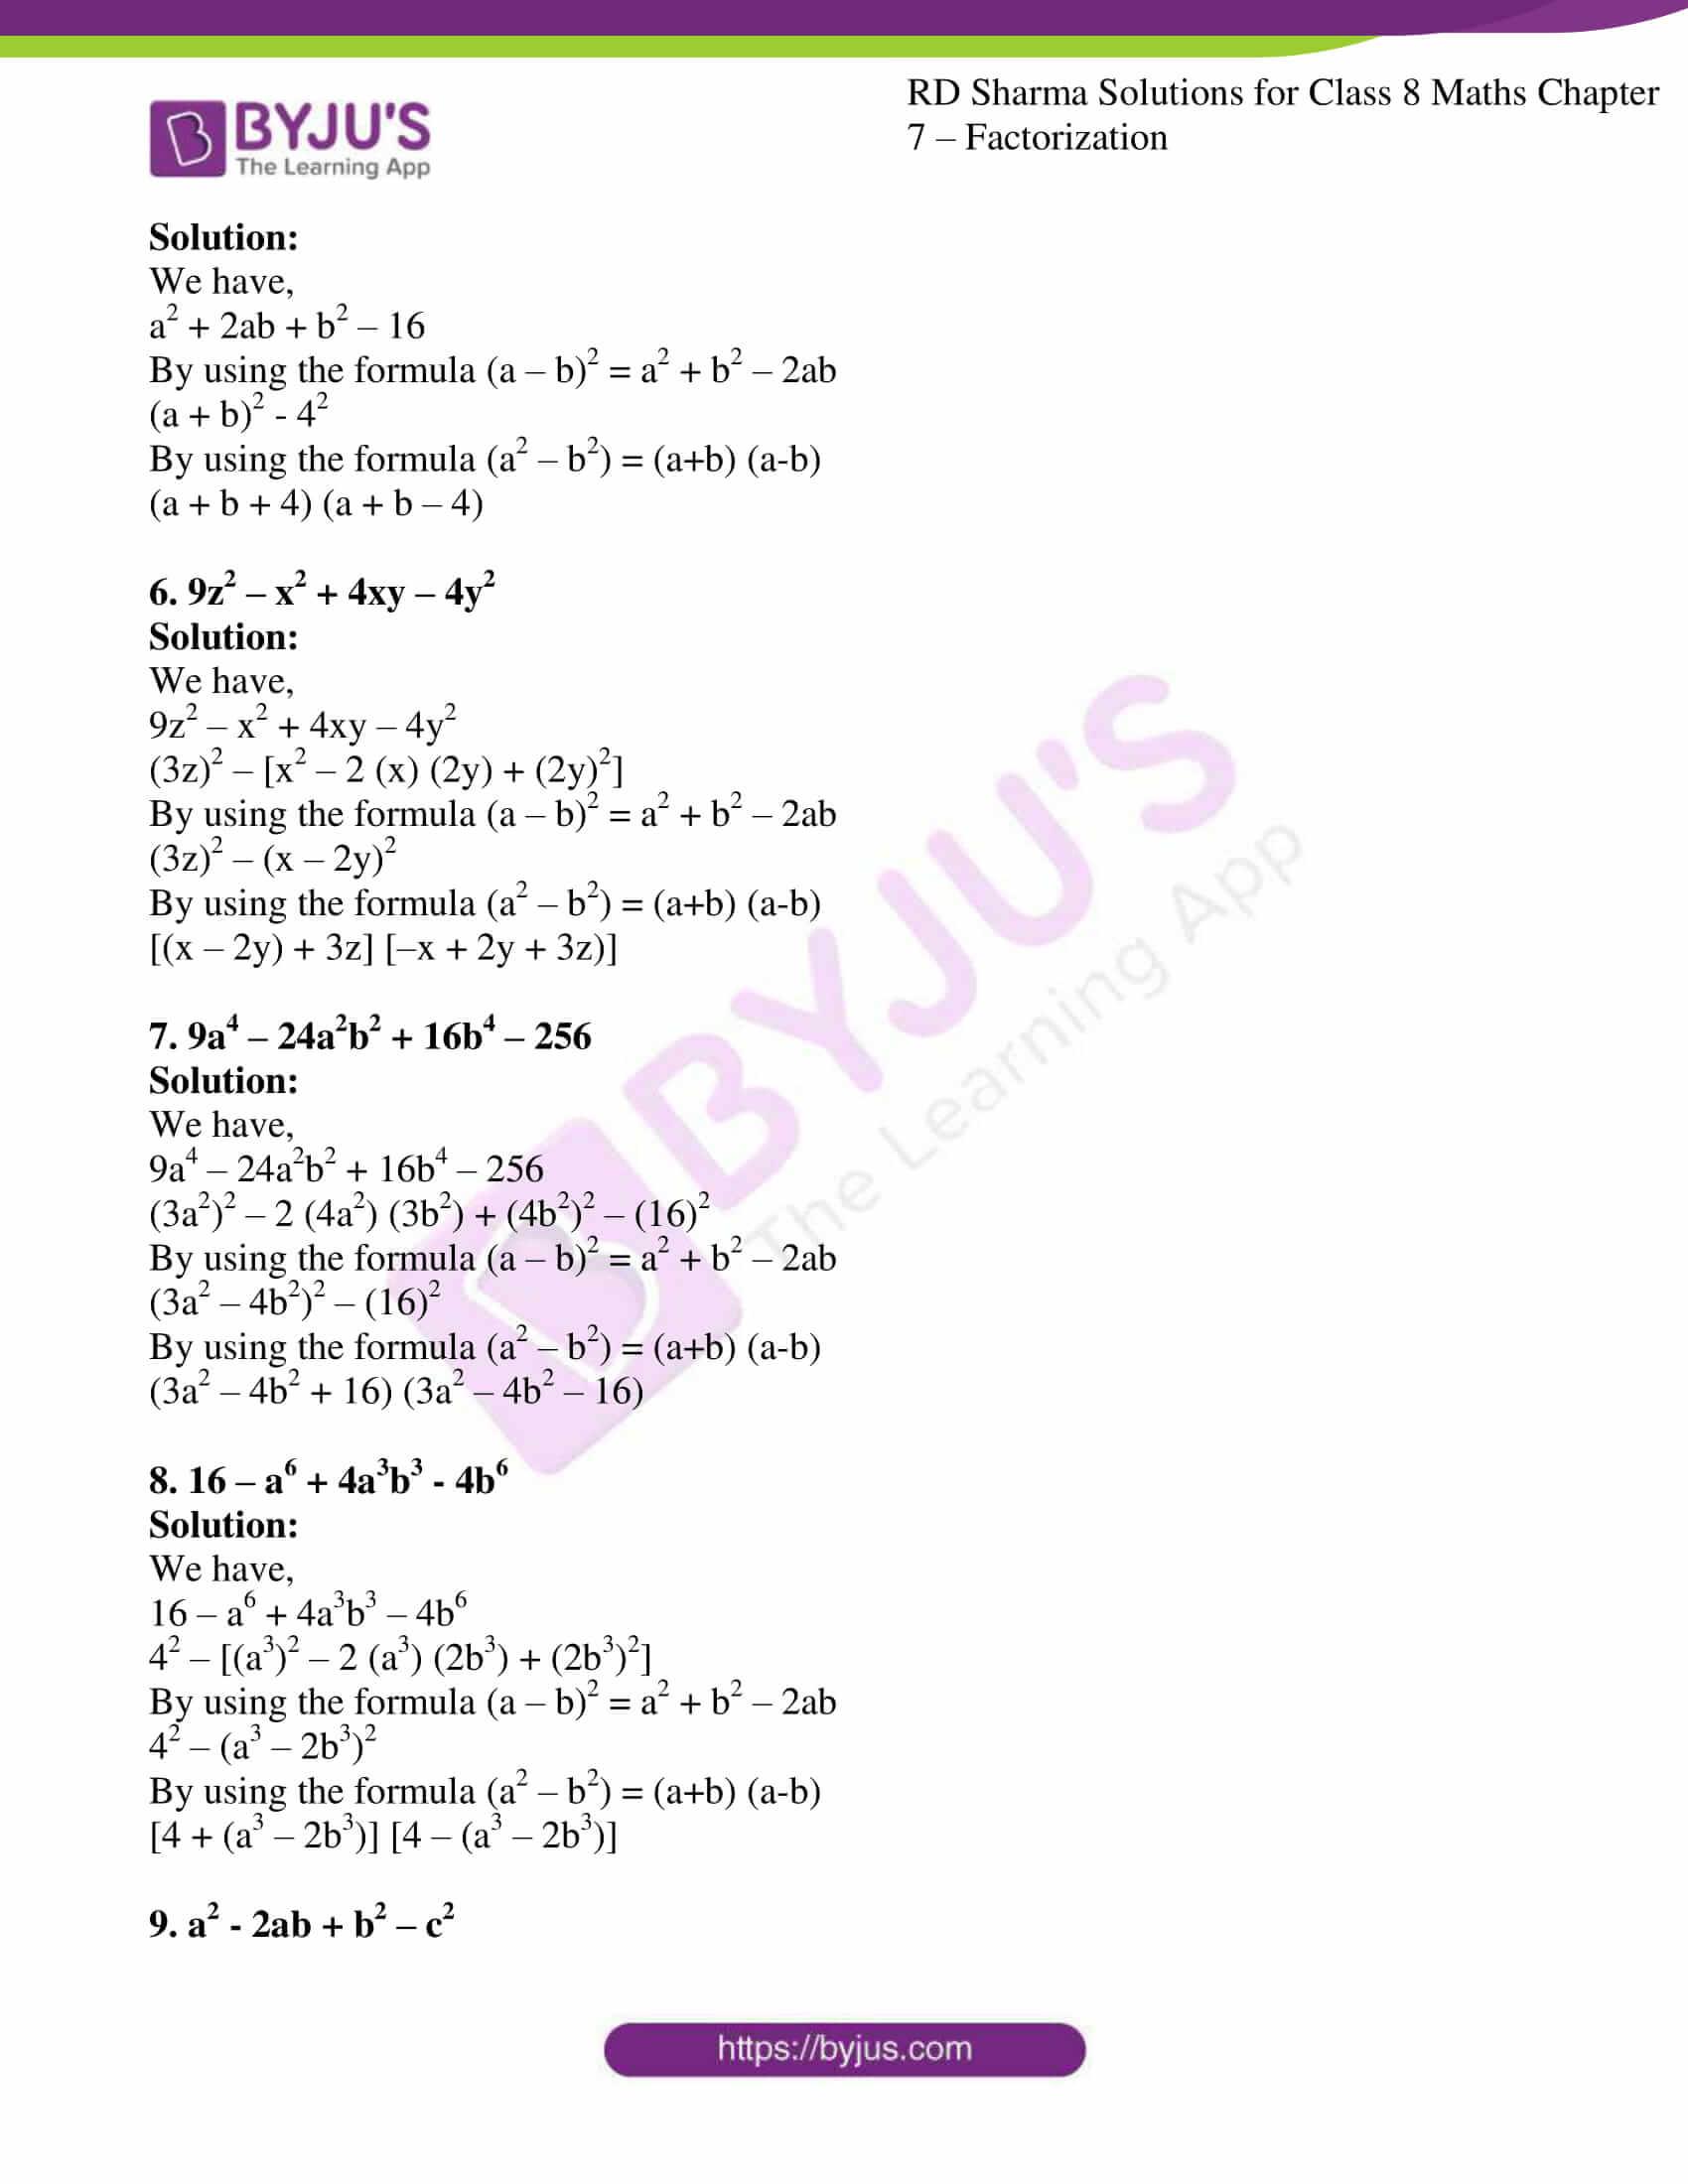 rd sharma class 8 maths chapter 7 exercise 6 2